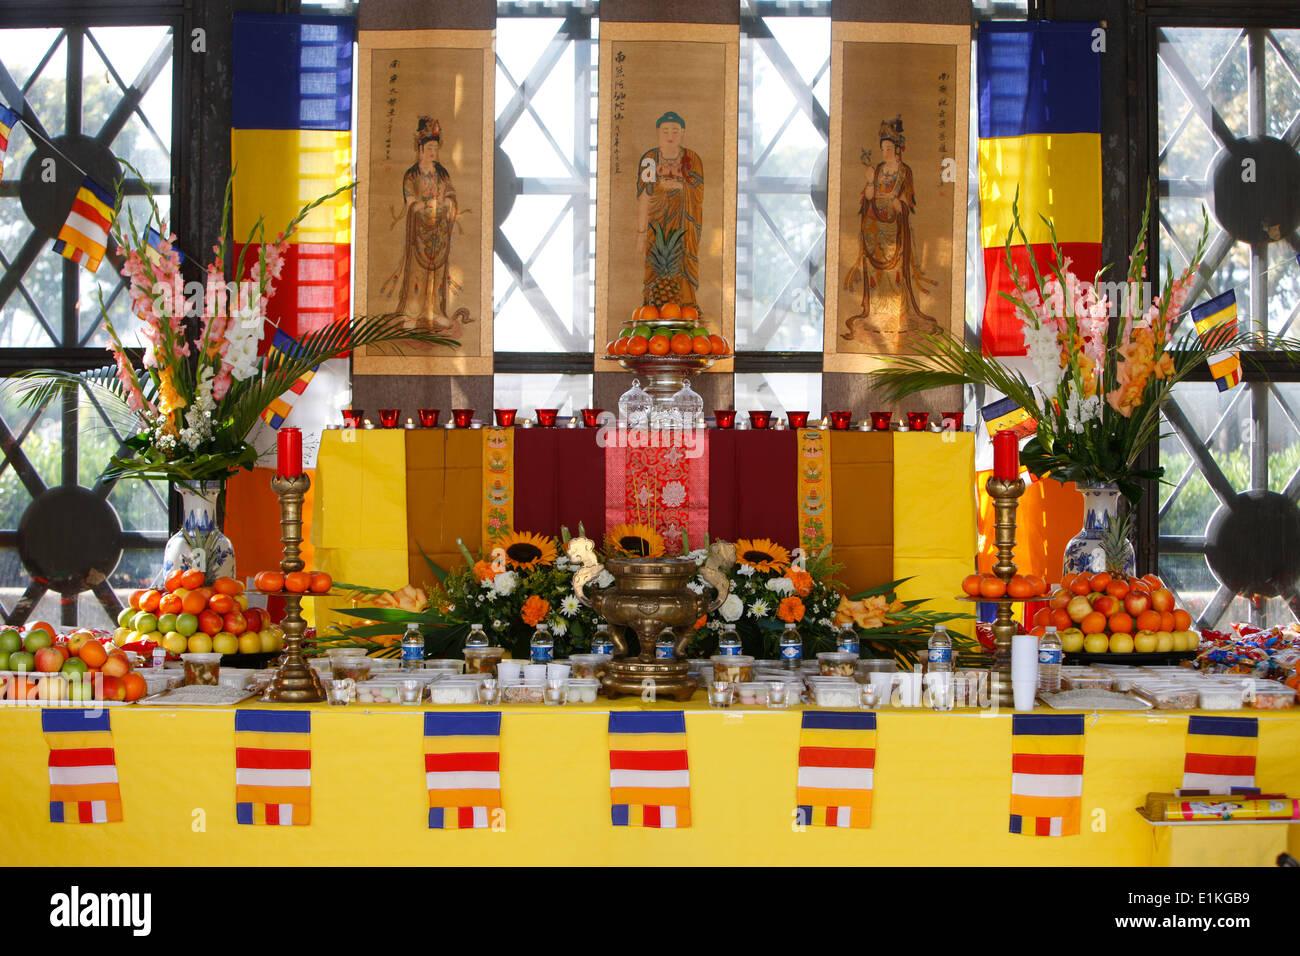 Buddhist altar for Ullambana wandering soul ceremony - Stock Image